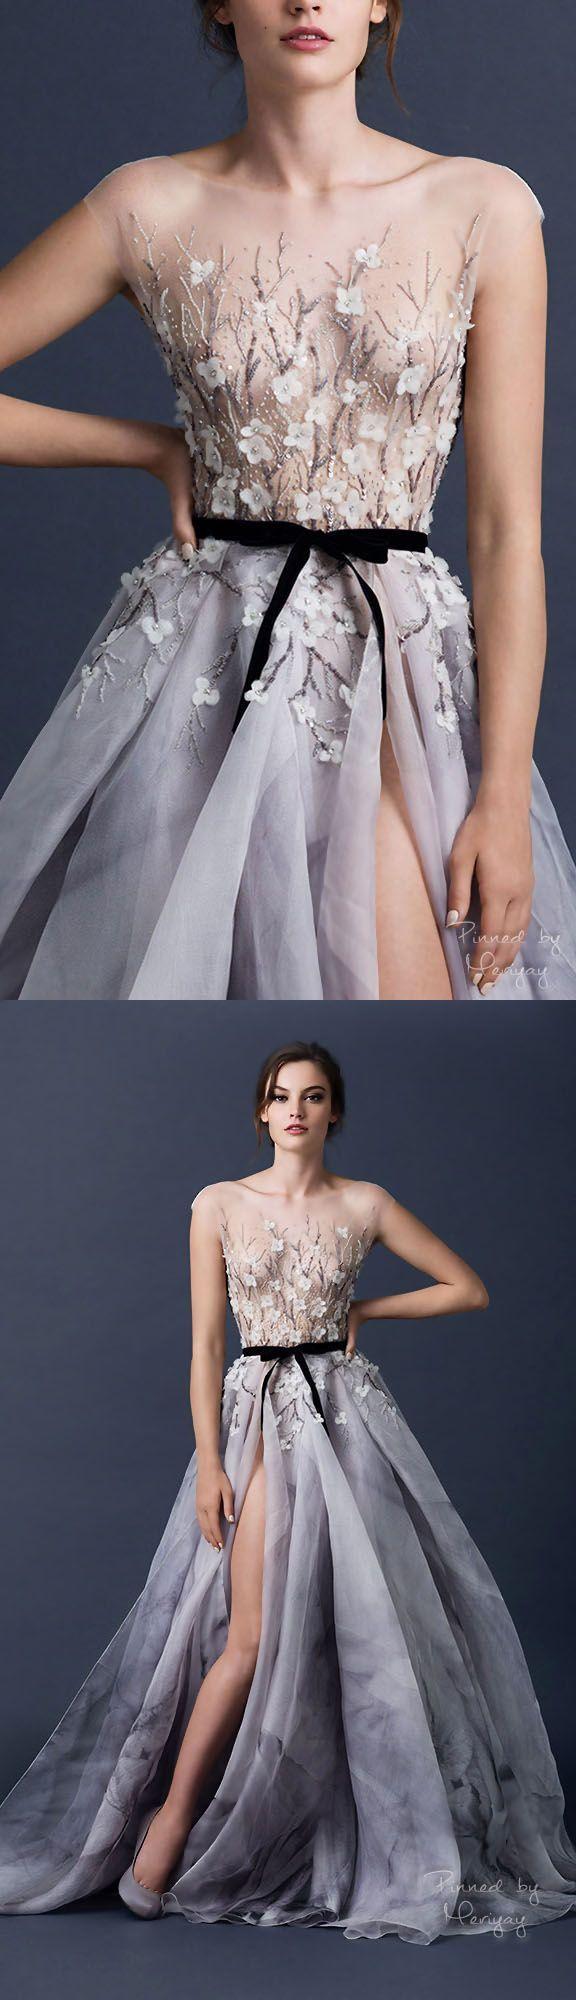 Apegada nesse vestido womenfashionparadiseshopify